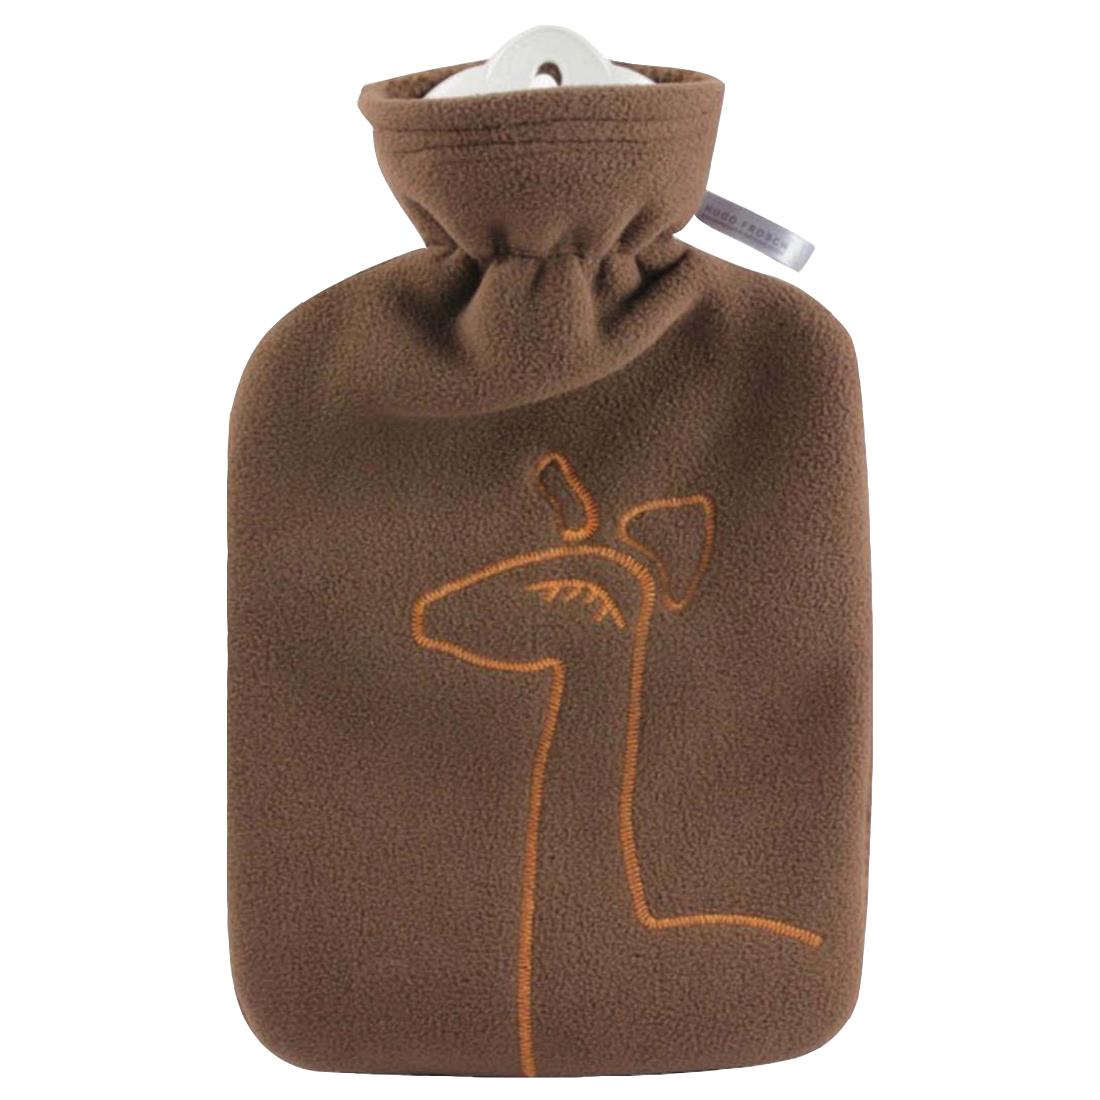 کیسه آبگرم هوگو فروش طرح زرافه ظرفیت 1.8 لیتر